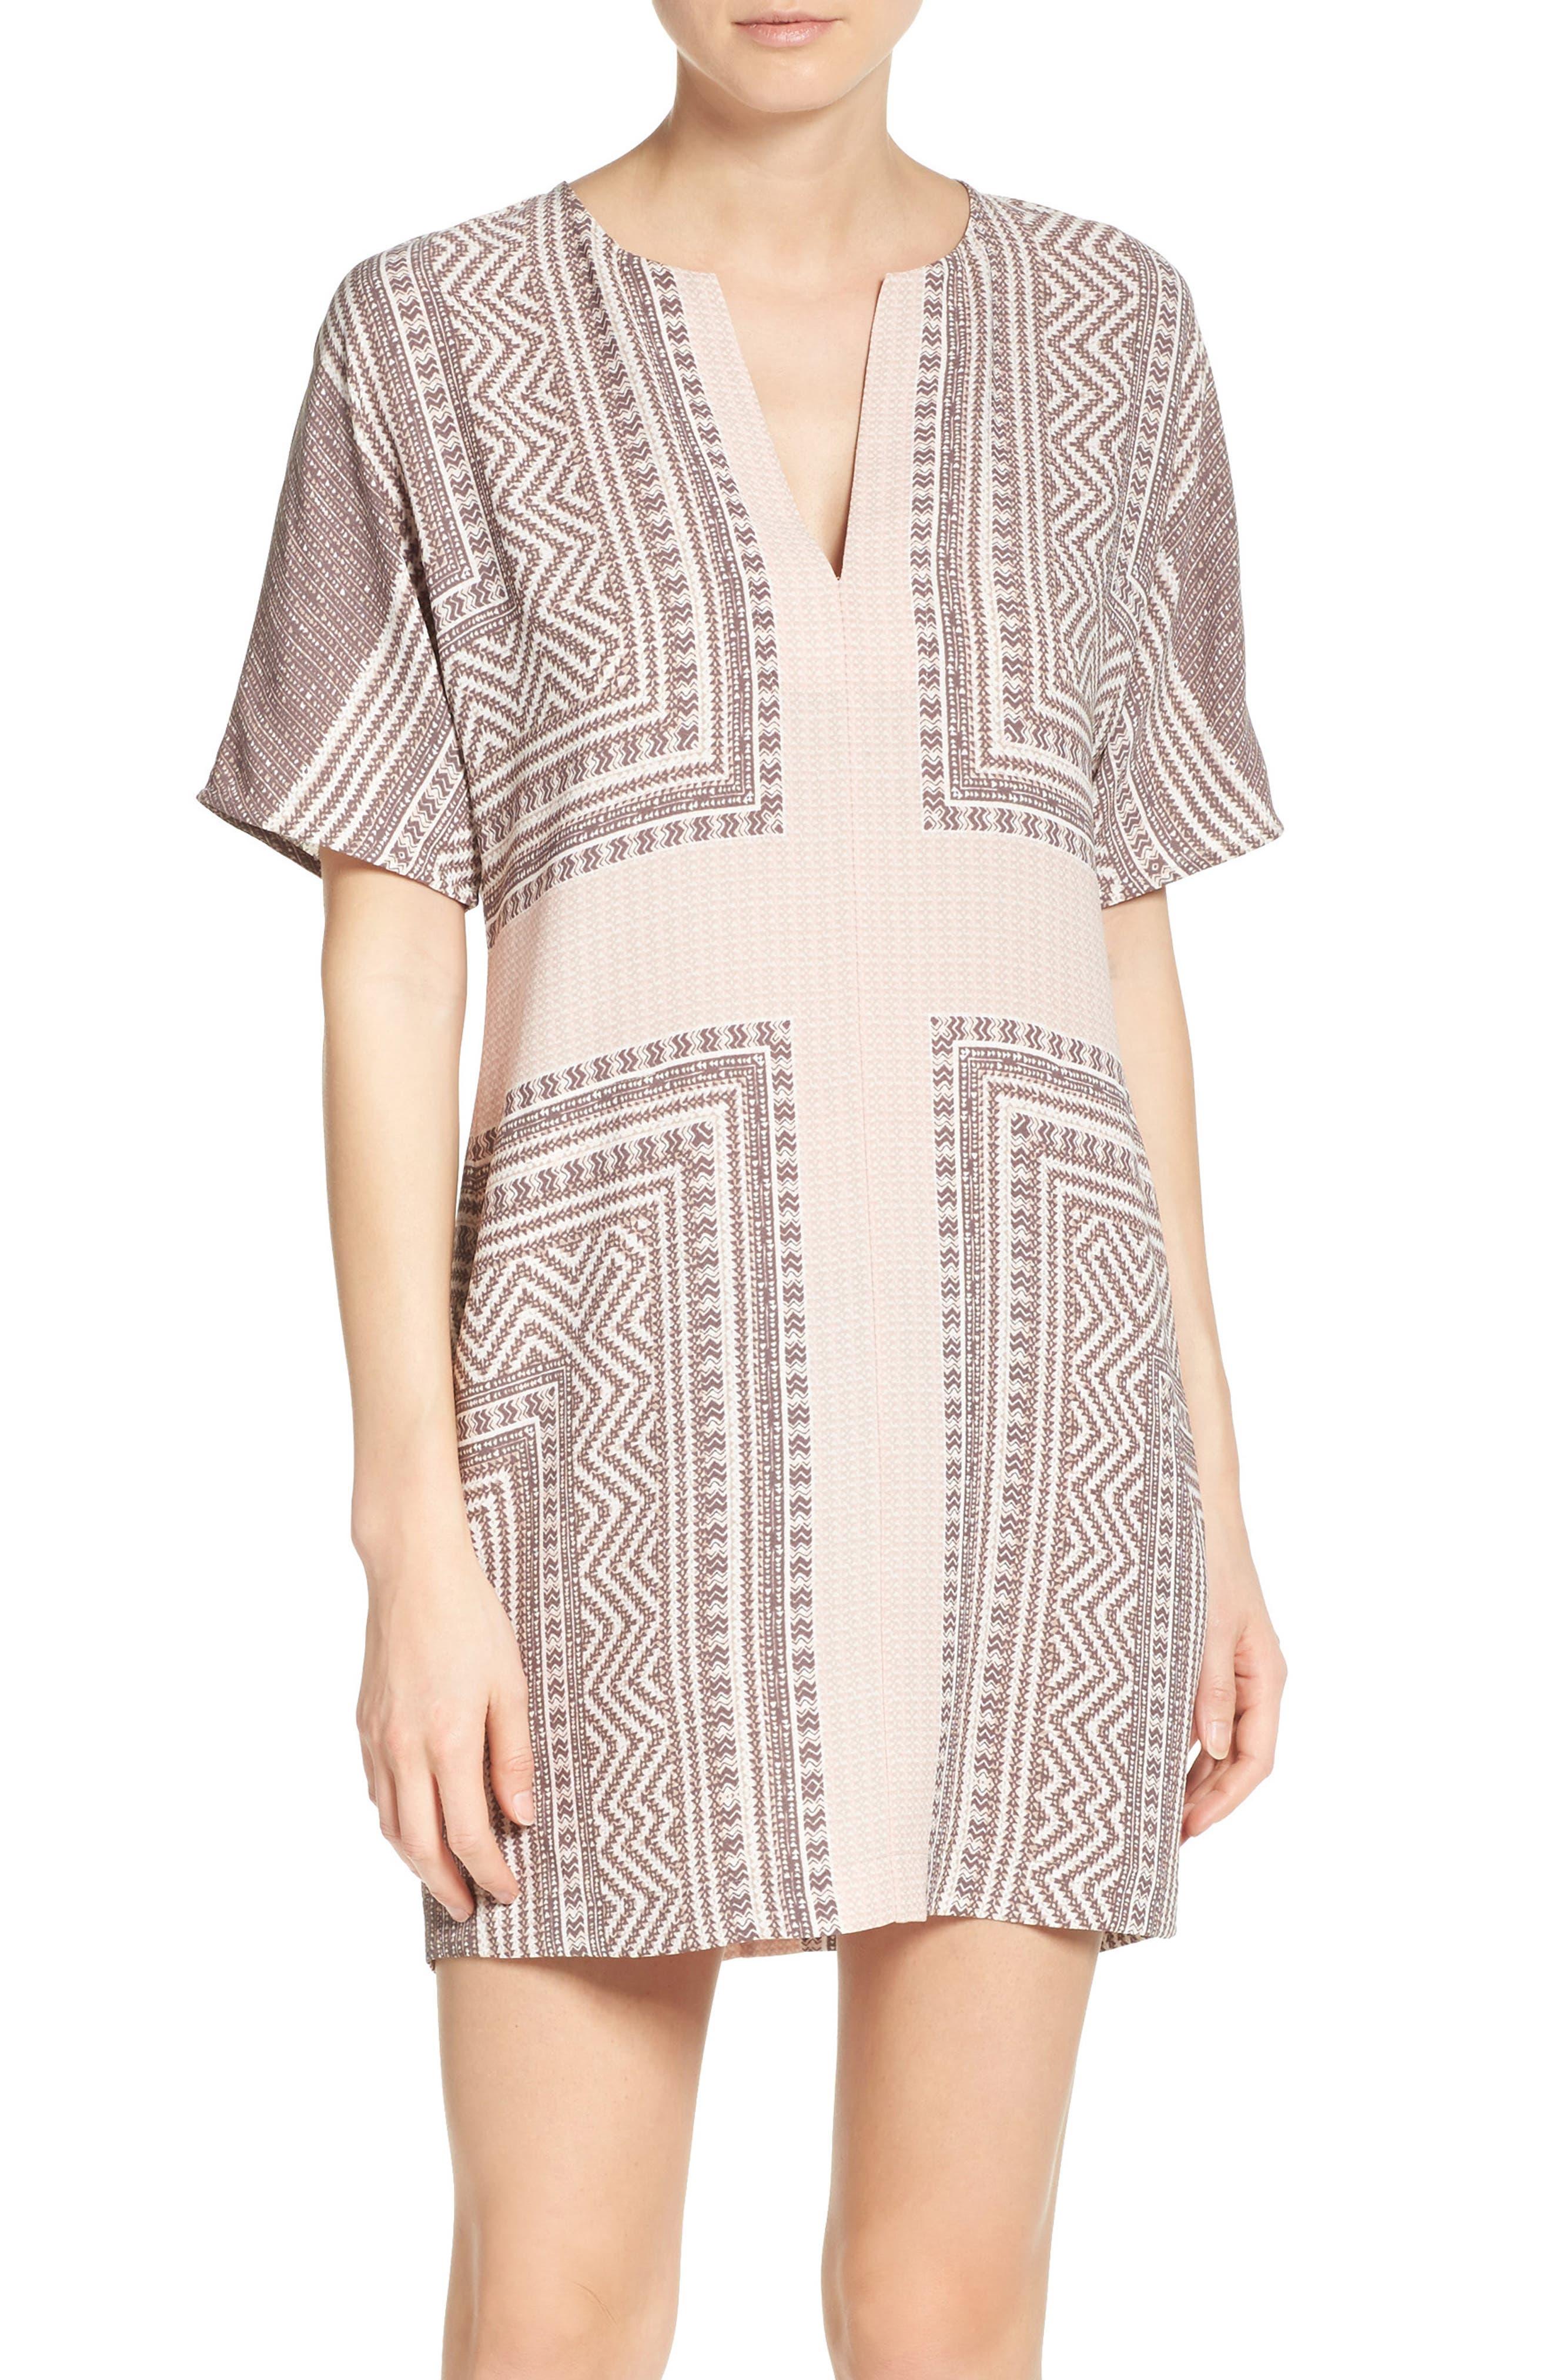 Main Image - BCBGMAXAZRIA Scarf Print Dress